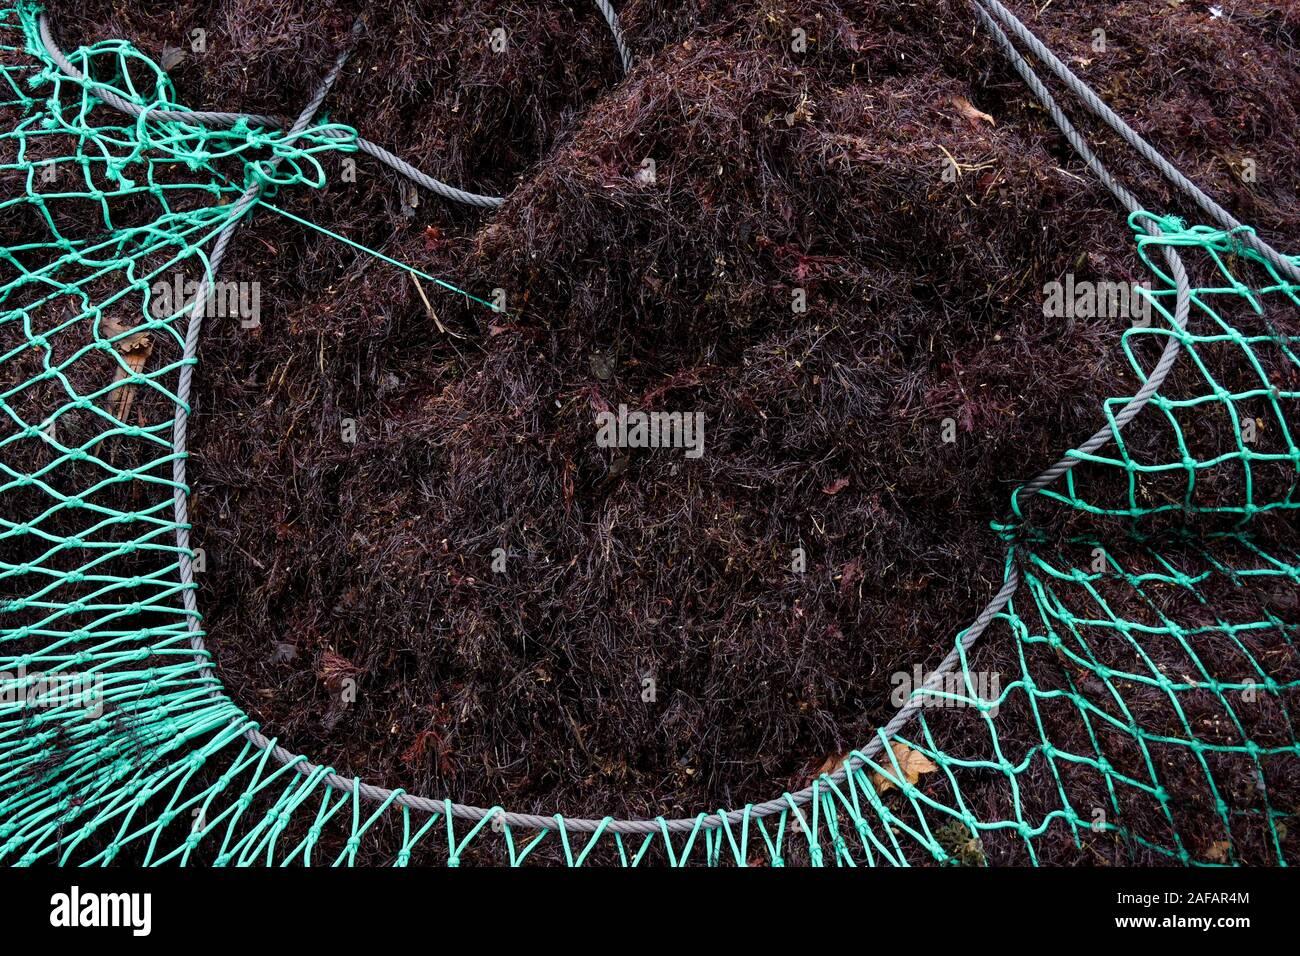 Fishing nets full of red algae, Saint-Jean de Luz, Pyrénées-Atlantiques, France Stock Photo